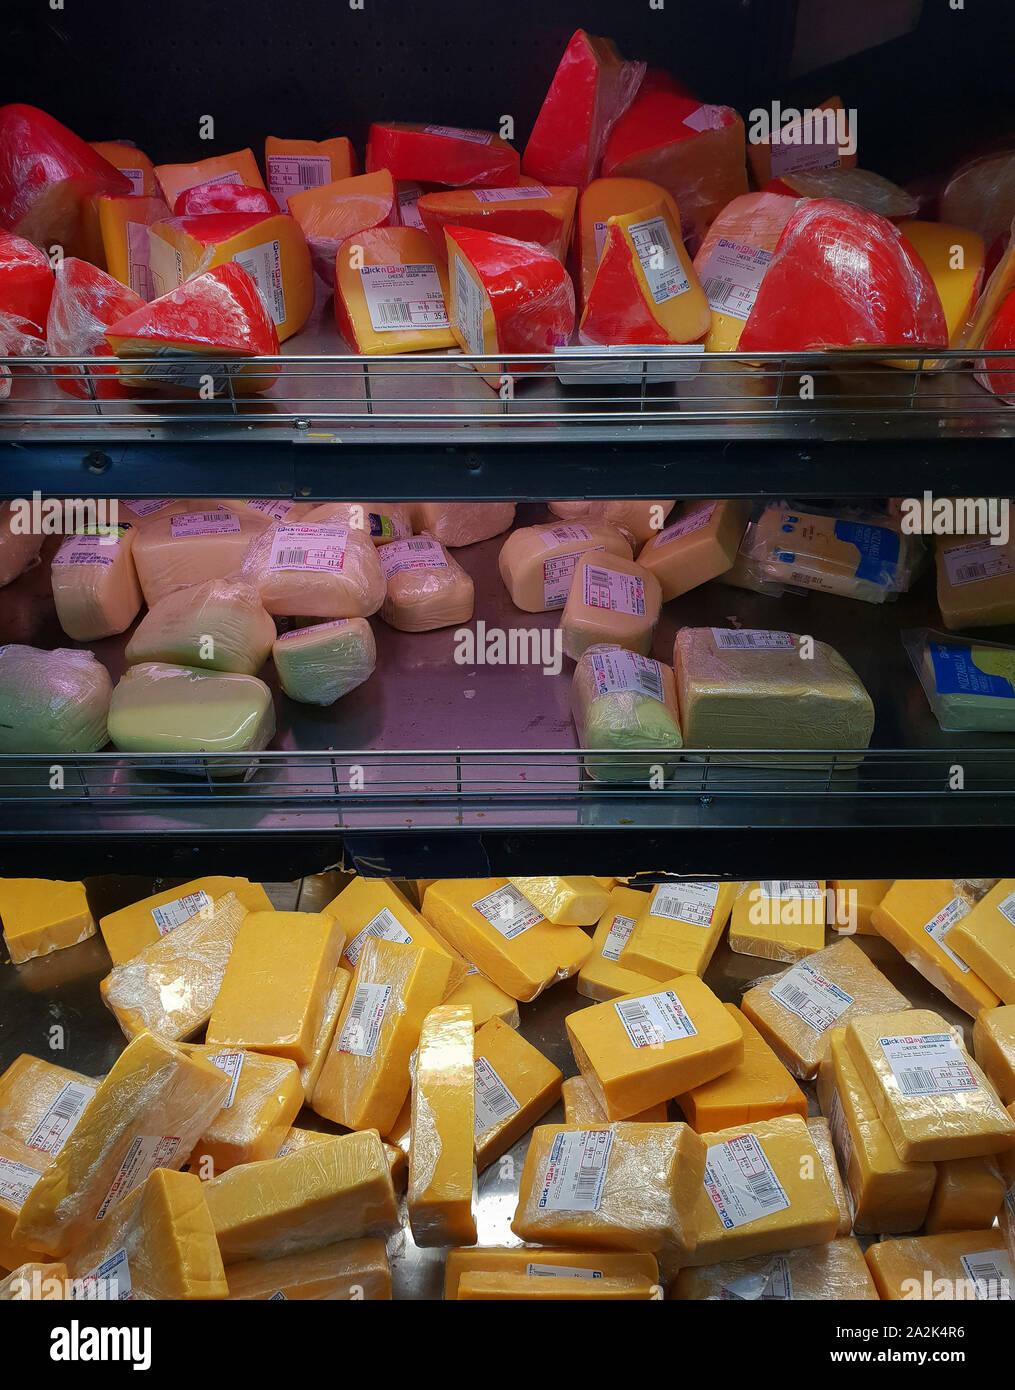 Supermarket Aisle Fridge Stock Photos Supermarket Aisle